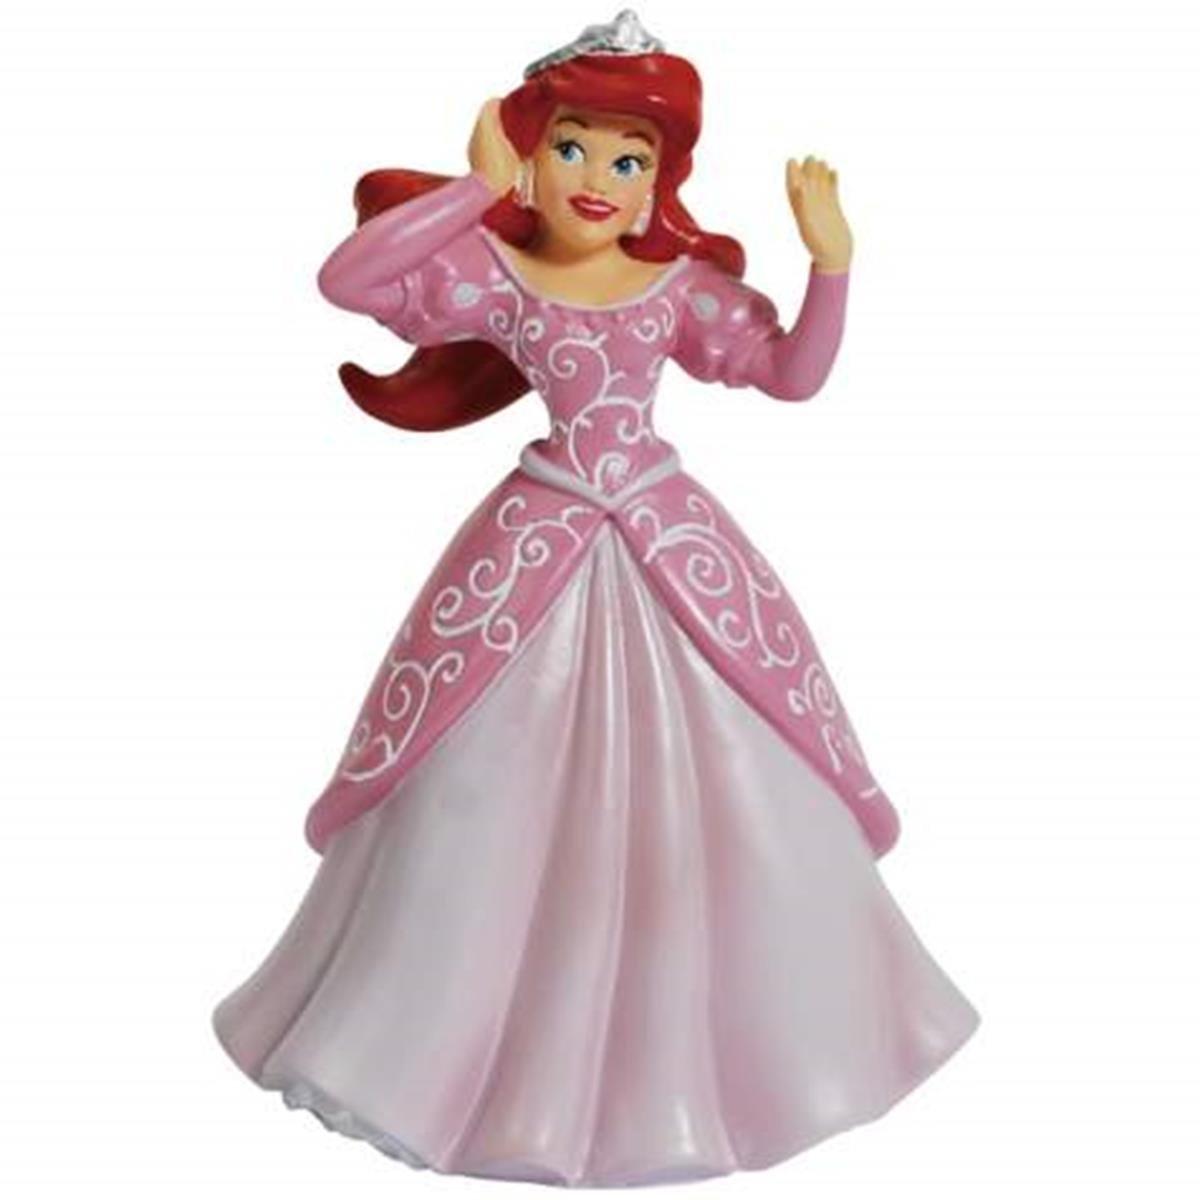 Buy Disney Princess Ariel Figurine in Purple Ball Gown Holding Clam ...